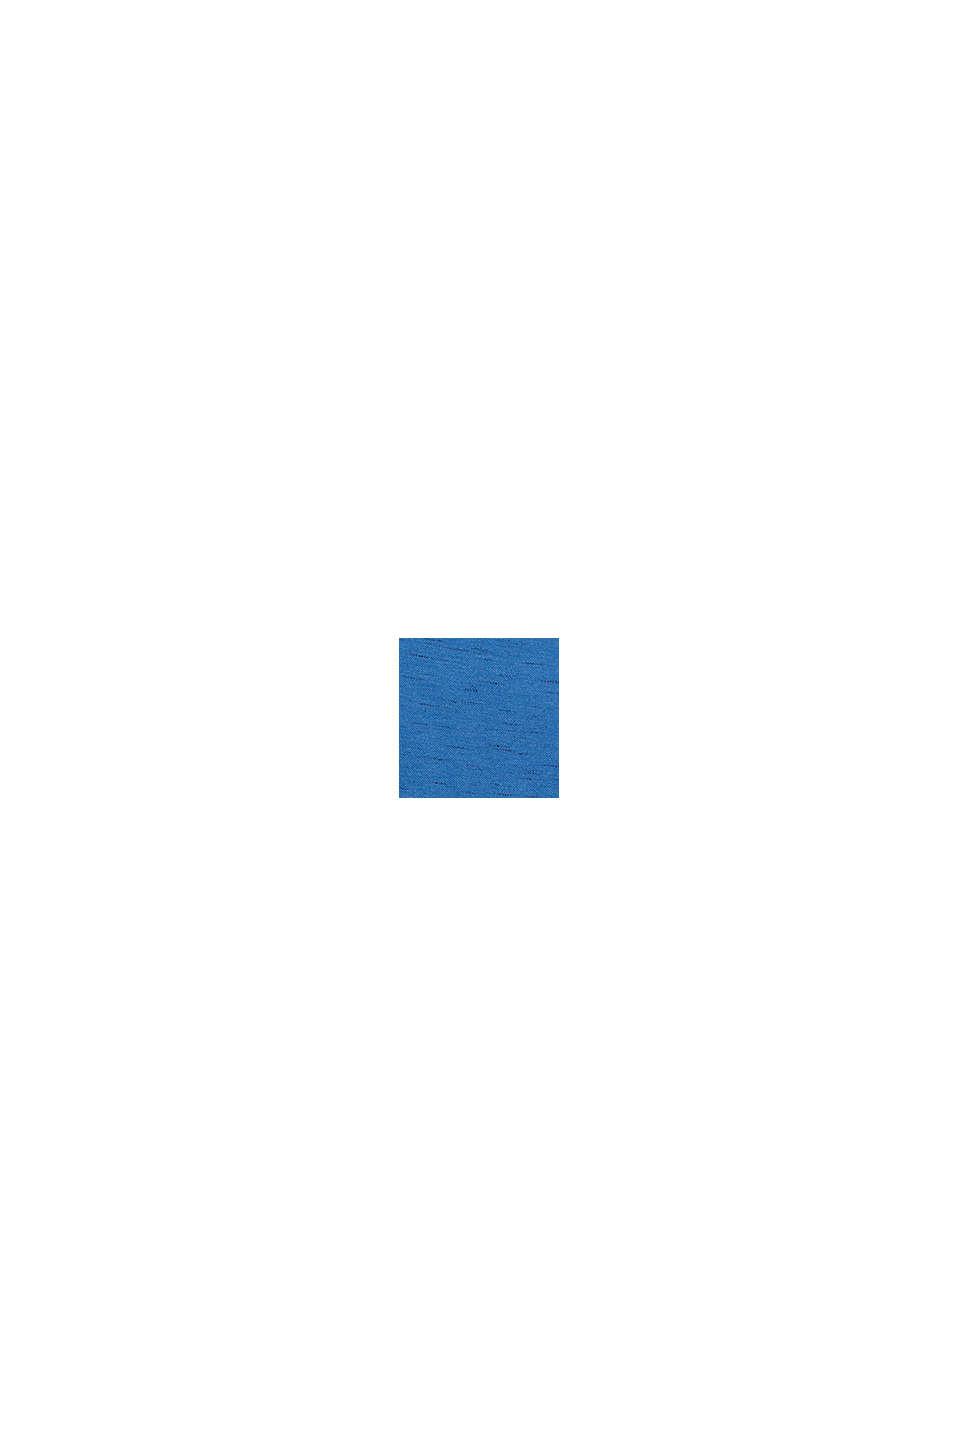 Piqué top made of organic cotton, BLUE, swatch